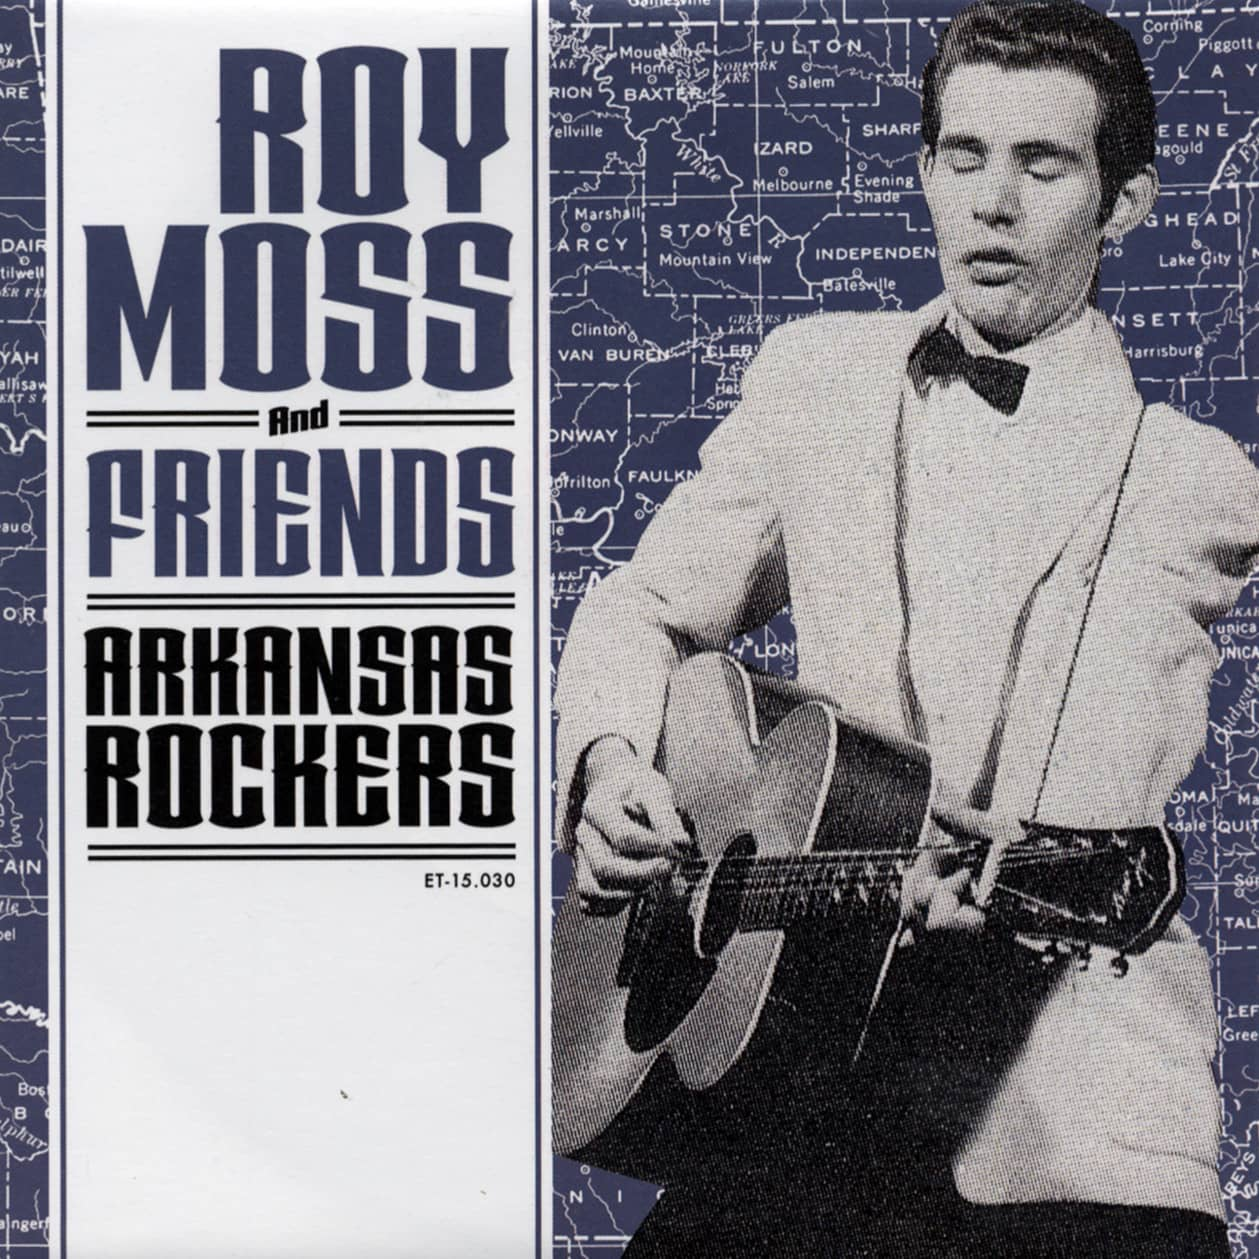 Roy Moss & Friends - Arkansas Rockers 7inch, 45rpm, EP, PS